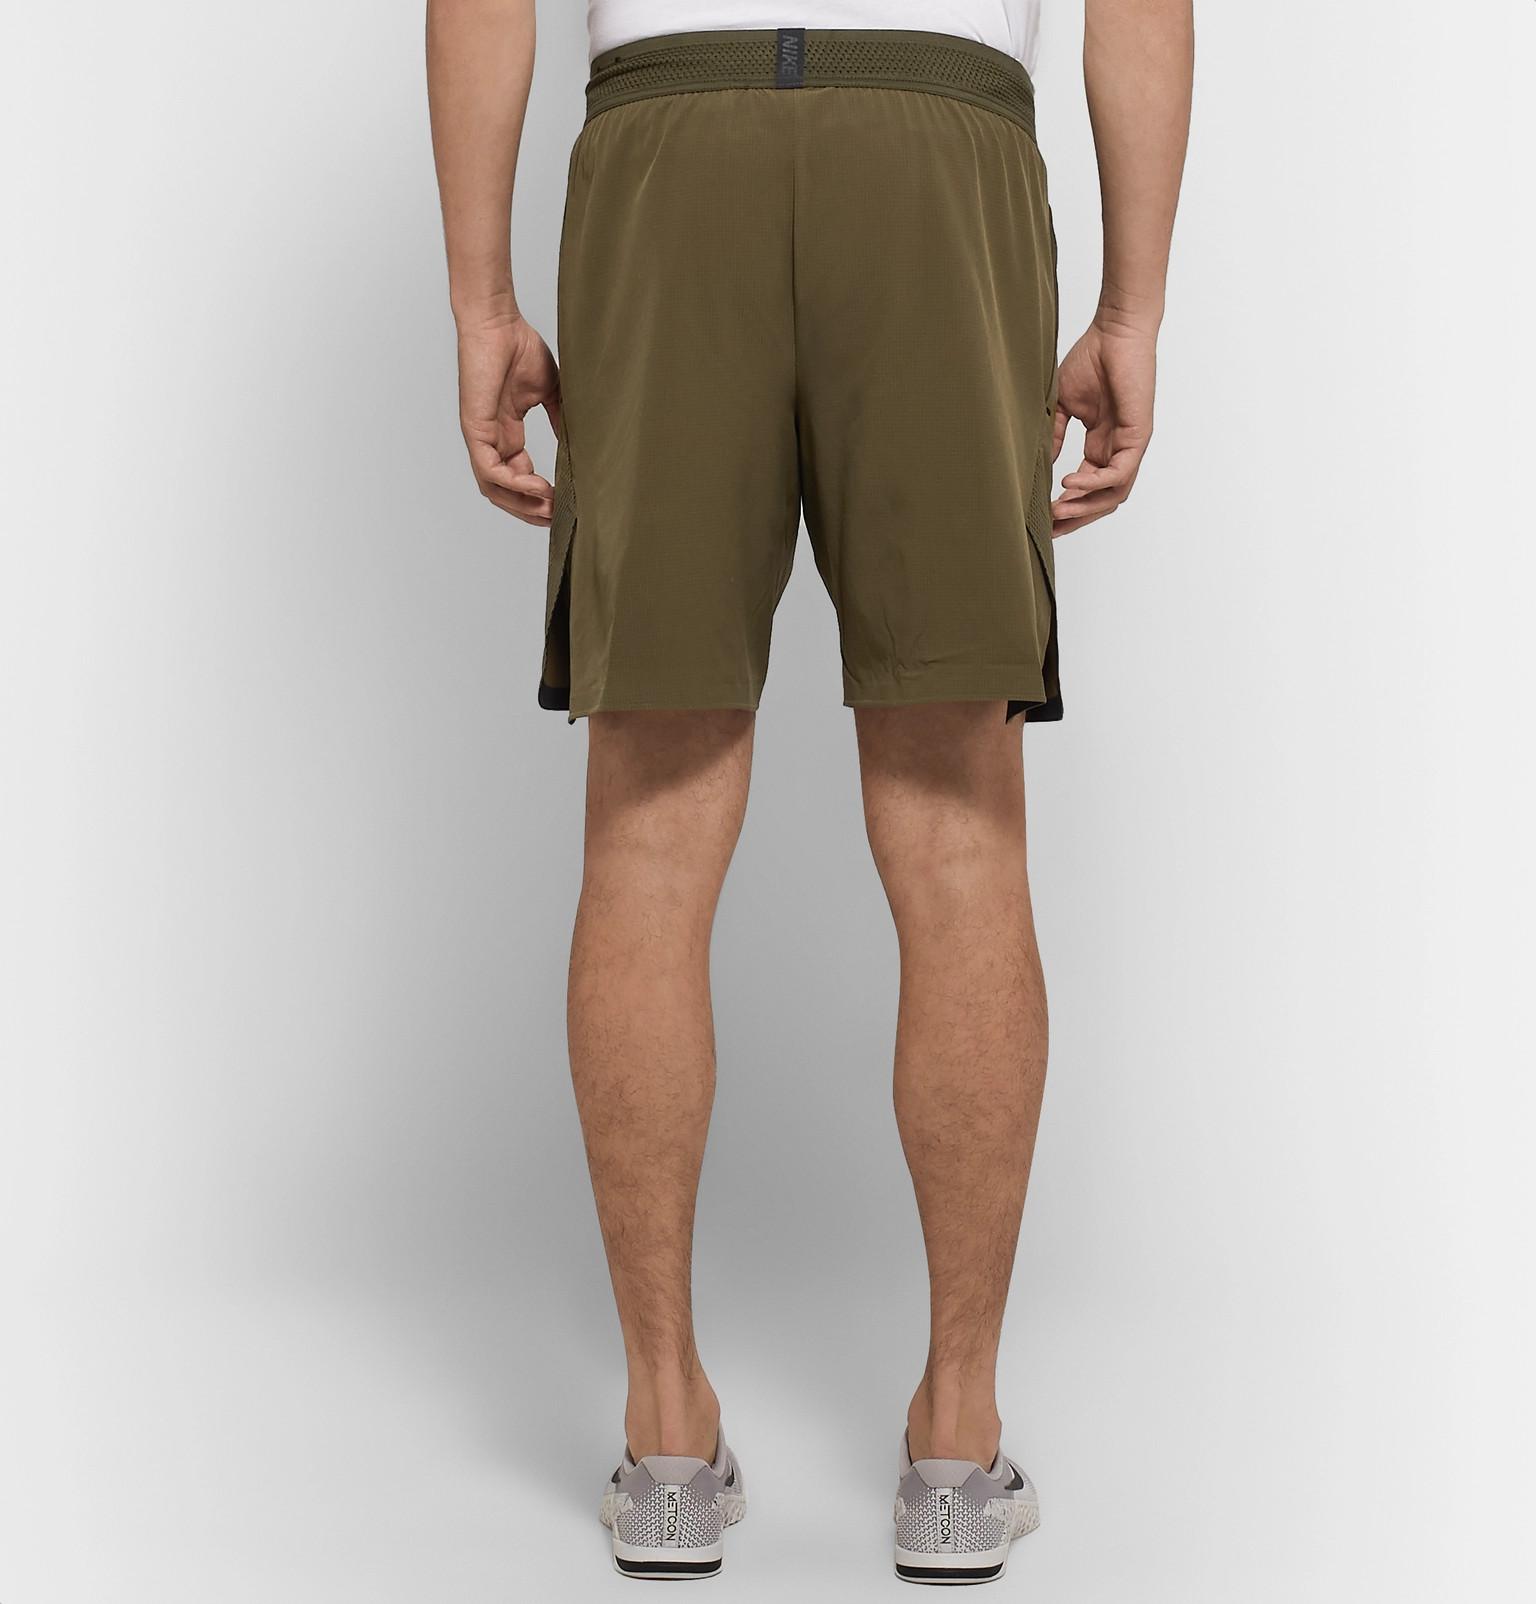 be826a846455 Nike Training - Flex-Repel 3.0 Ripstop Shorts